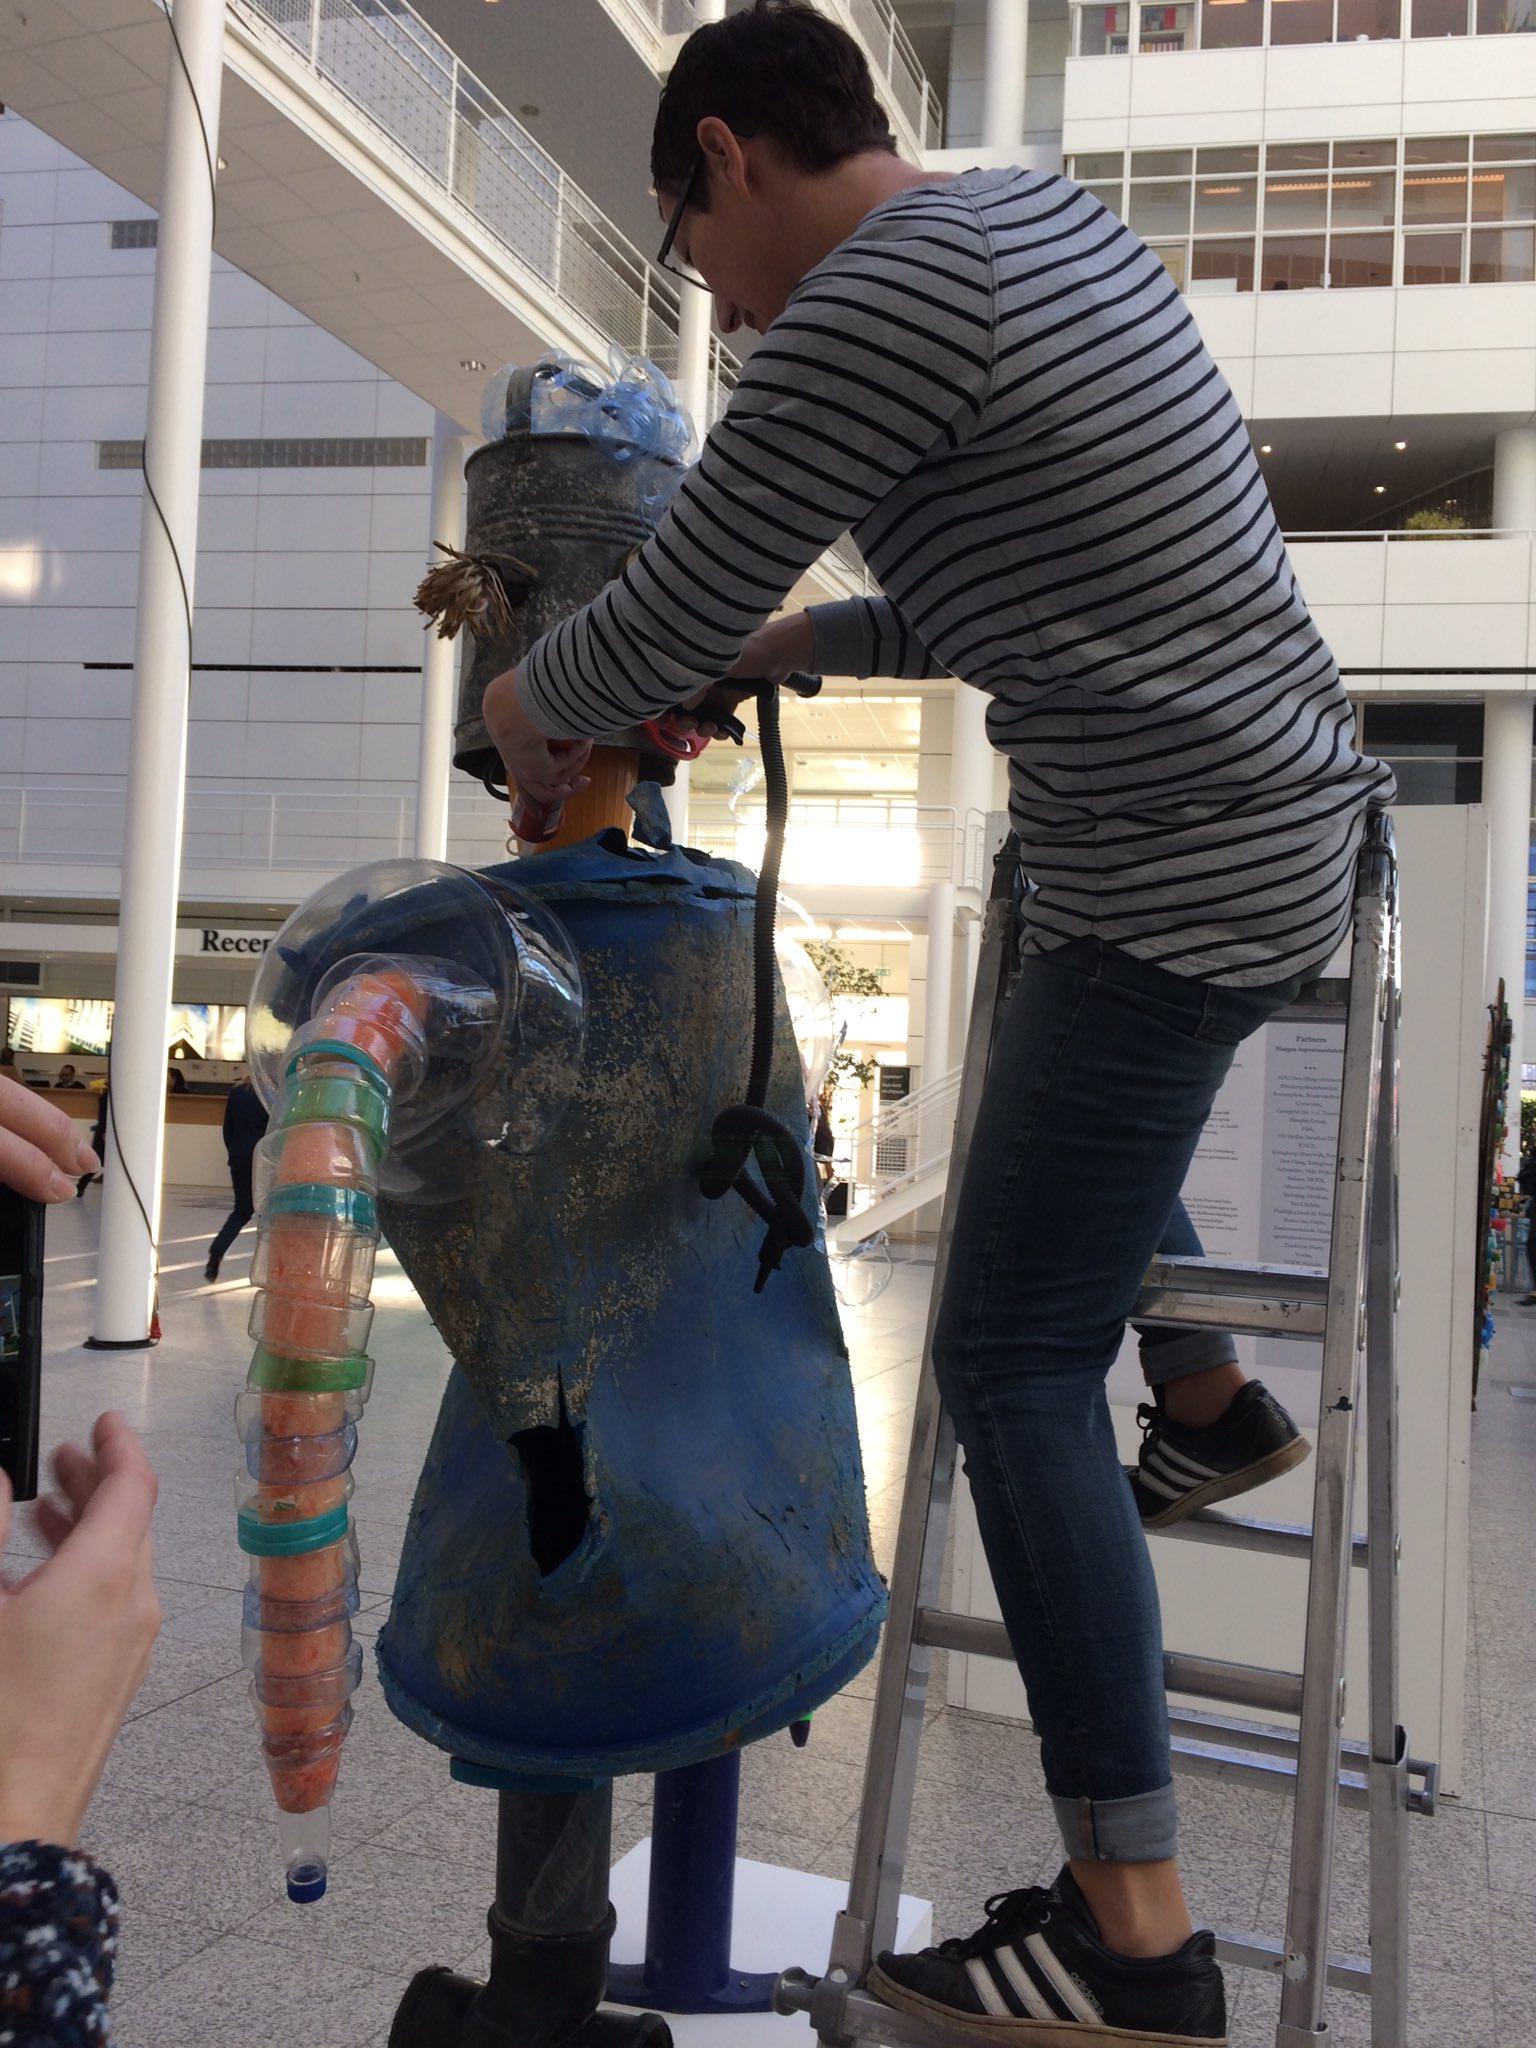 Tentoonstelling #opruimestafette in opbouw. @enterdreams https://t.co/0AE1F6G3RL